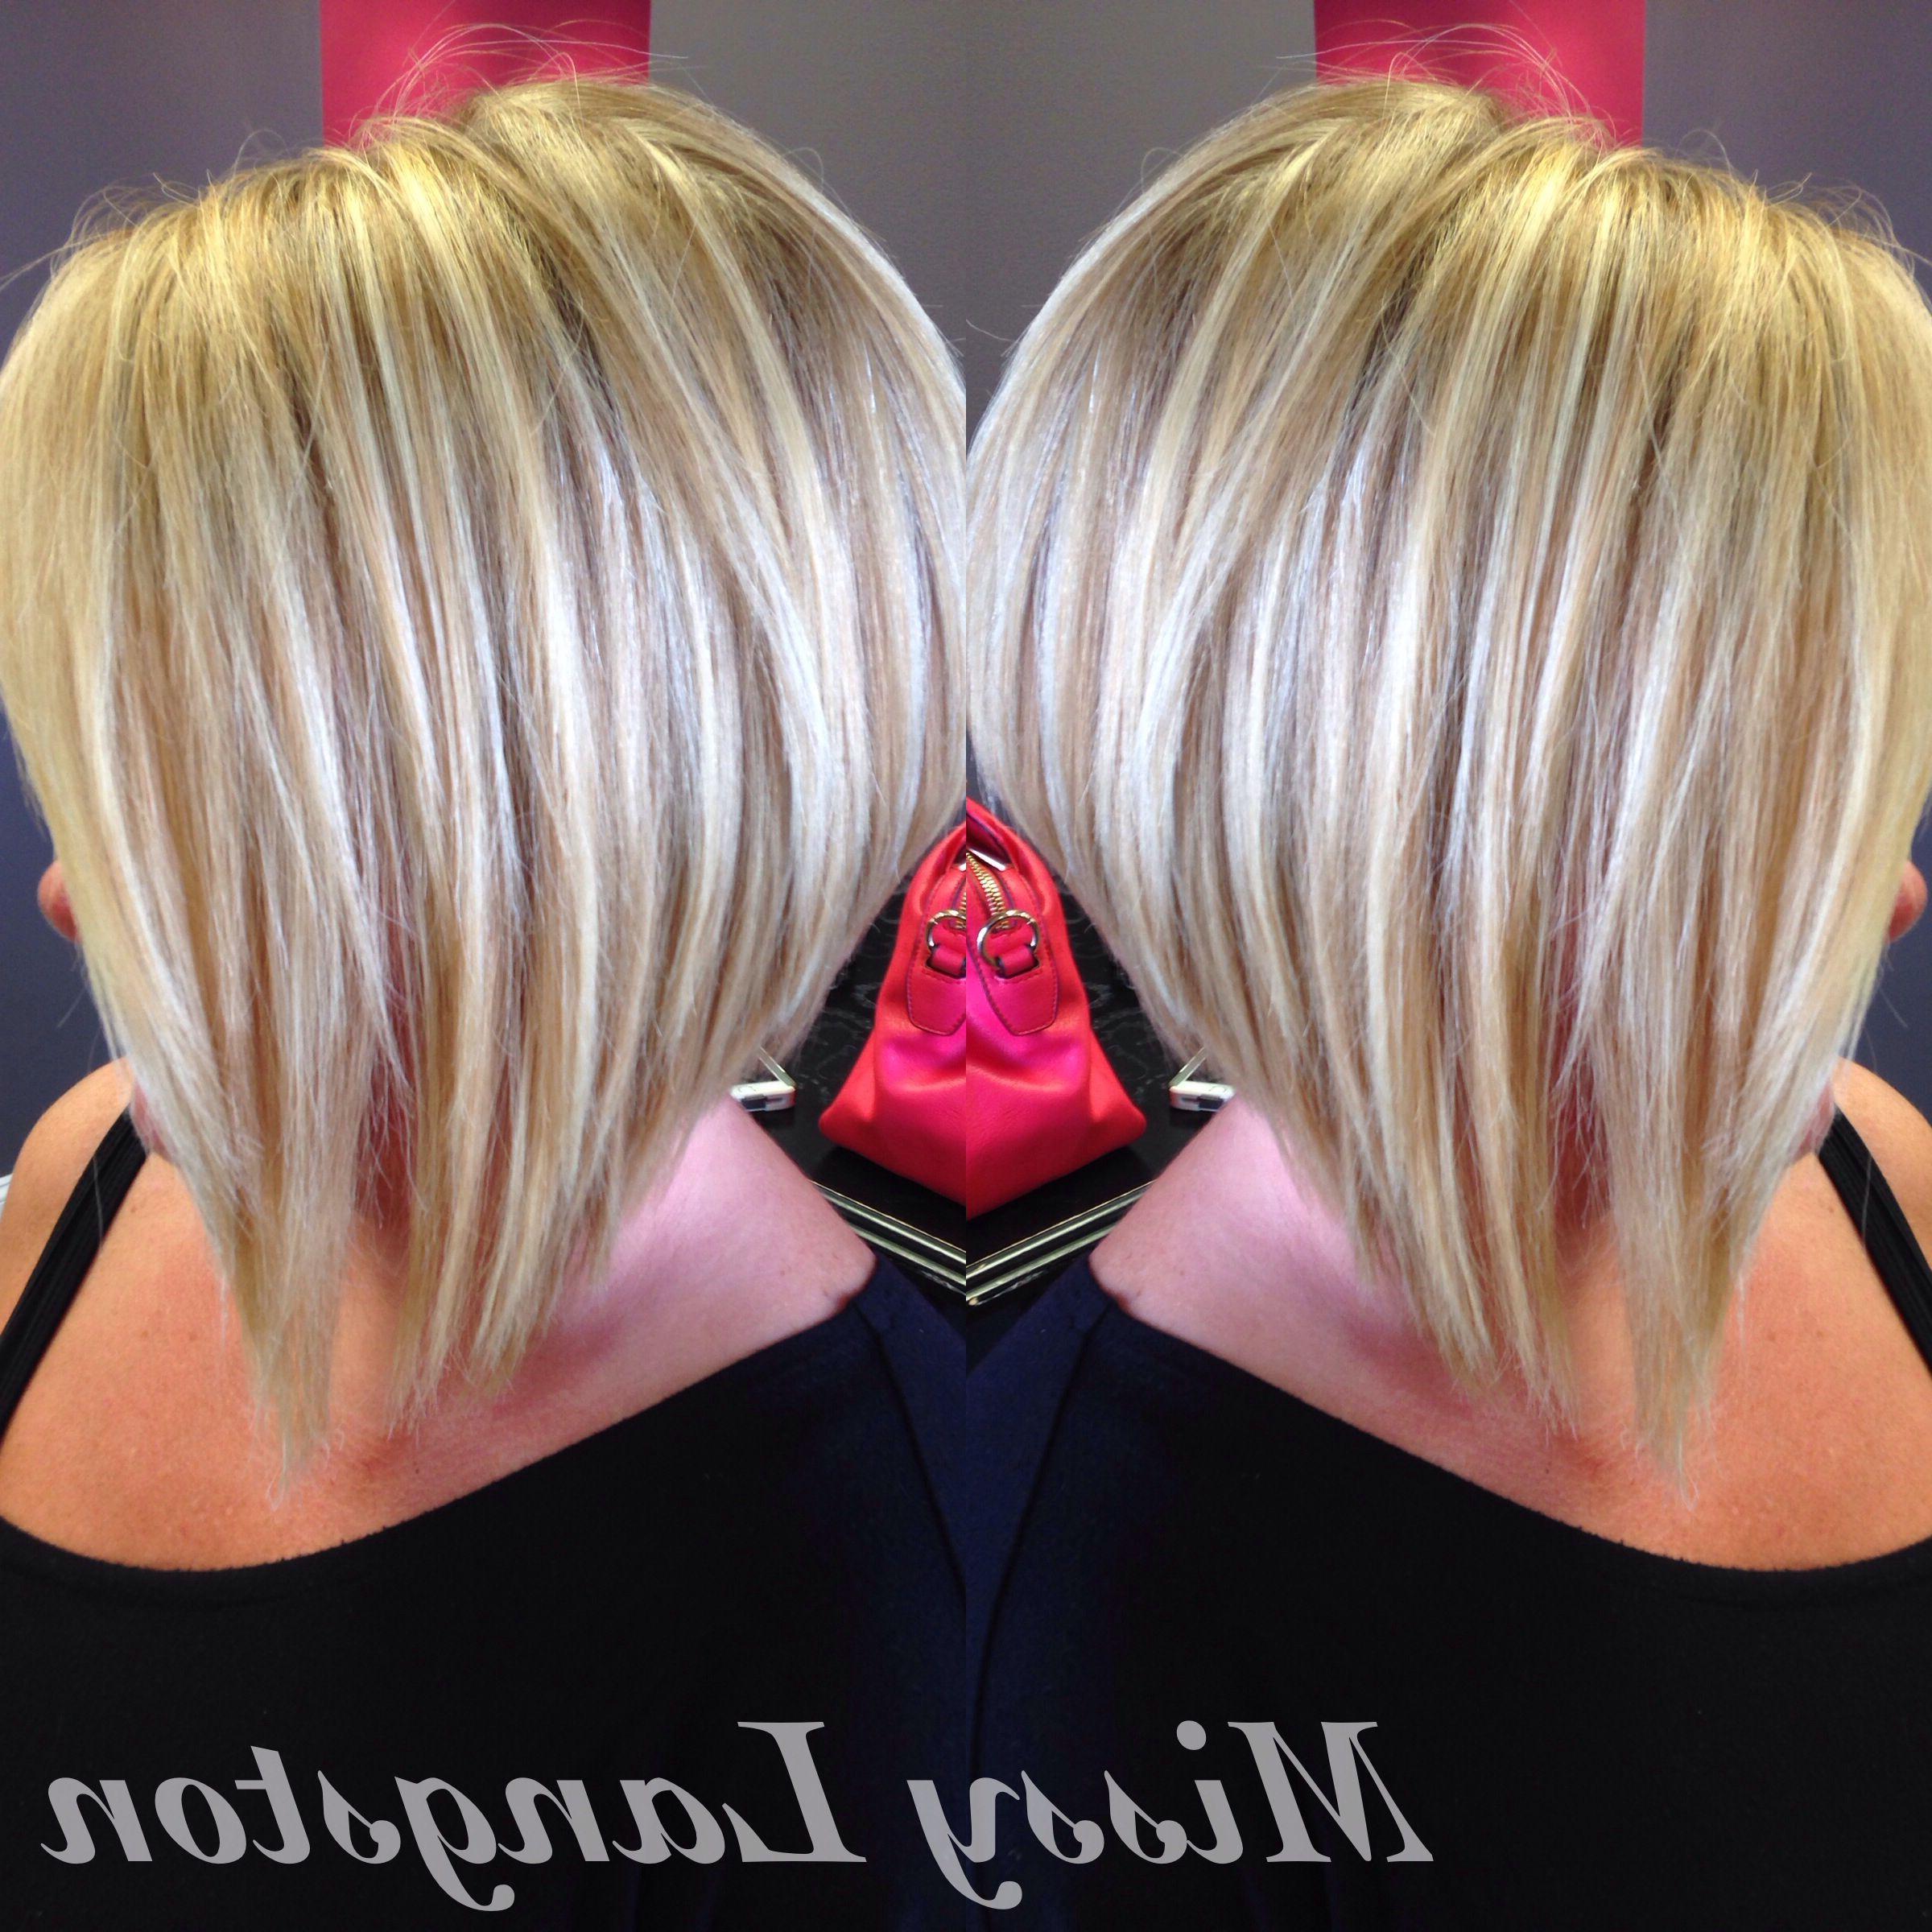 Short Blonde Inverted Bob Using Olaplexmissy Langston. Blondie's Pertaining To Short Blonde Inverted Bob Haircuts (Gallery 1 of 20)